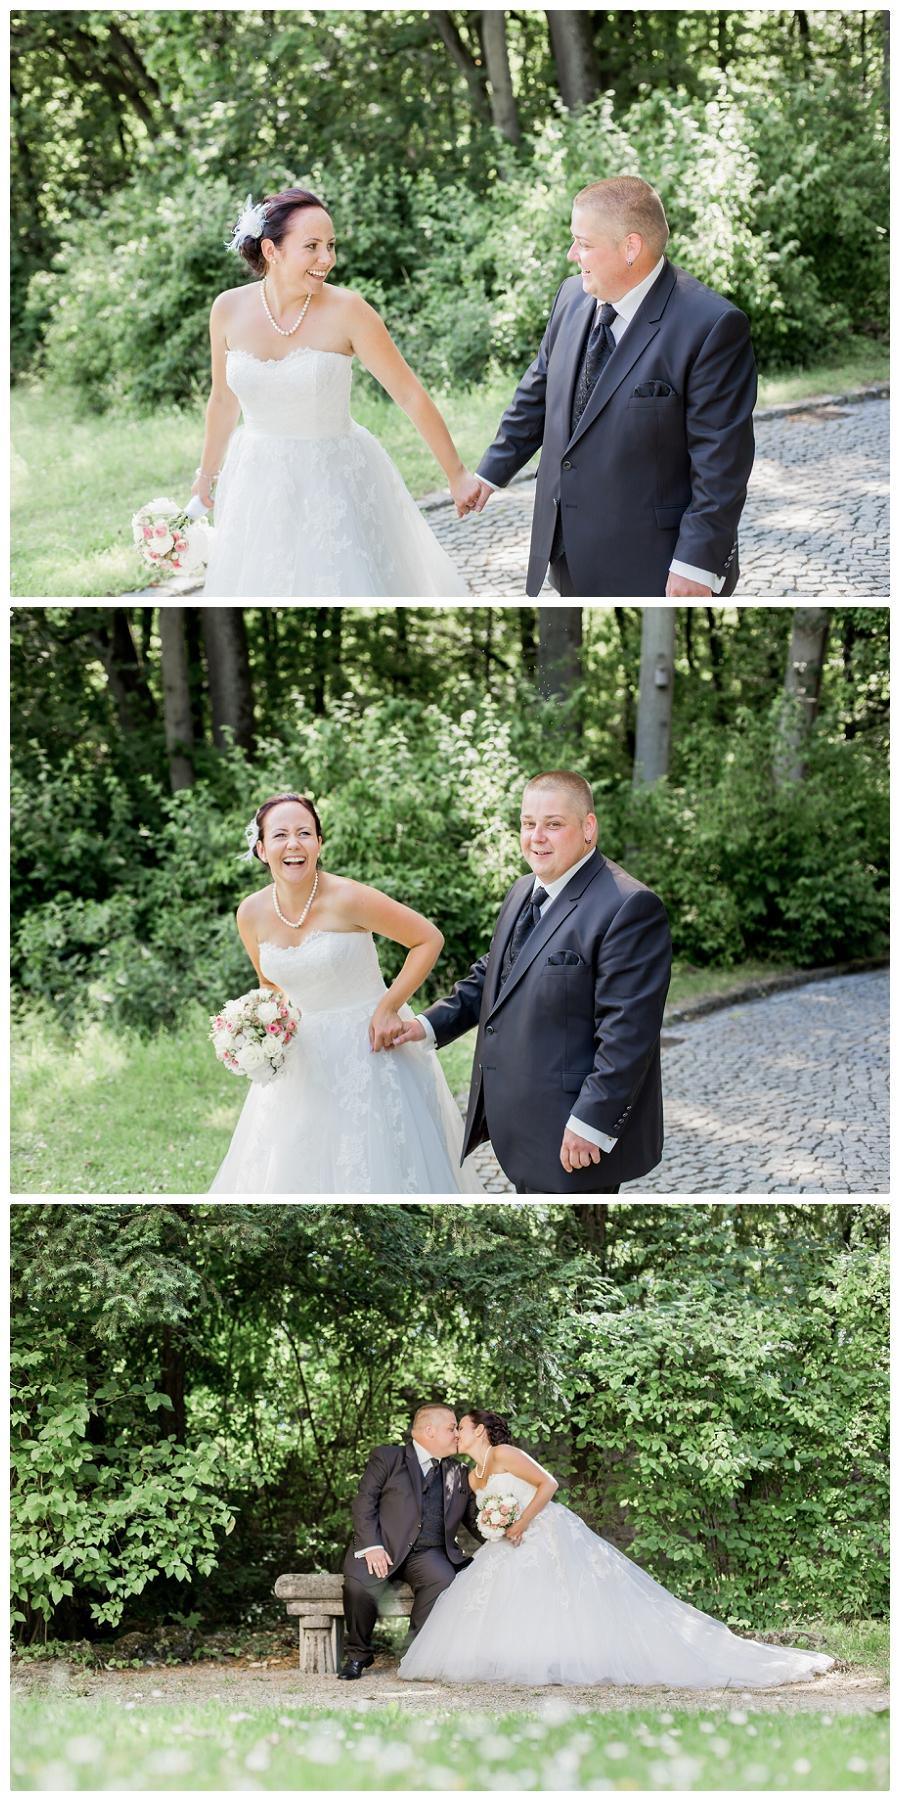 Hochzeit_Schlosspark-Rosenau_ClaudiaPelny_0048